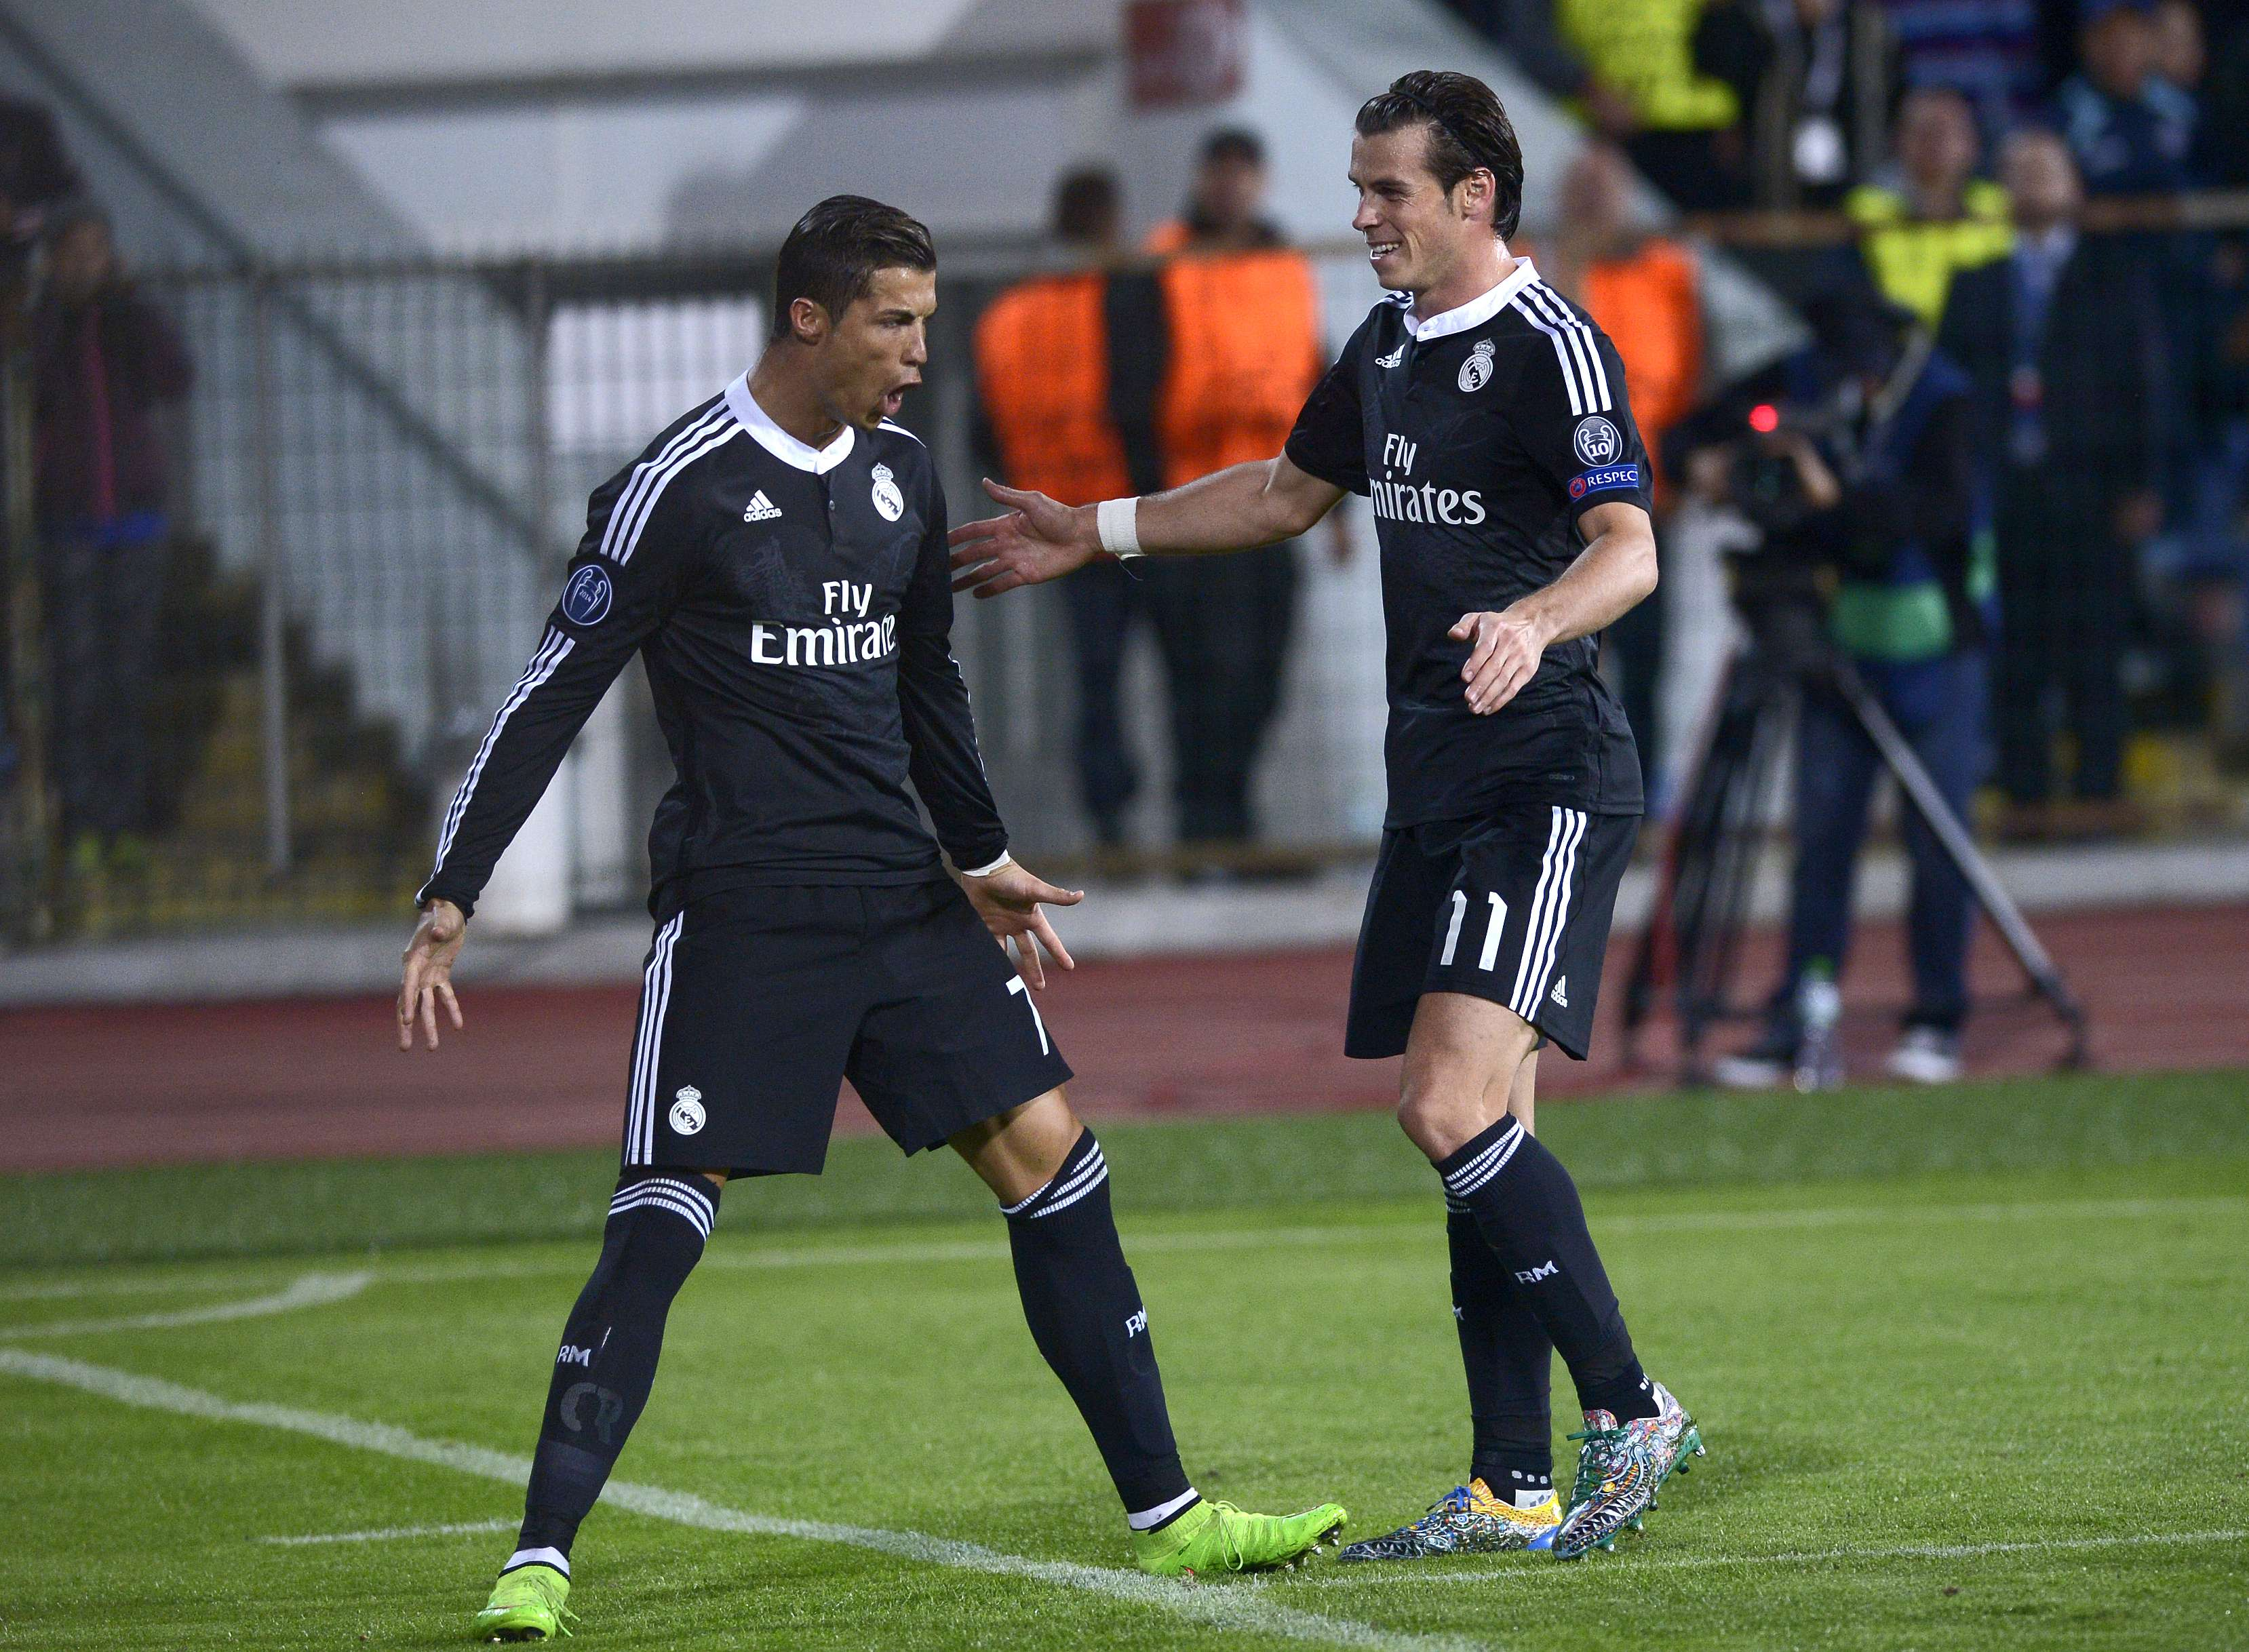 Bale festeja gol de Cristiano Ronaldo Foto: Dimitar Dilkoff/AFP